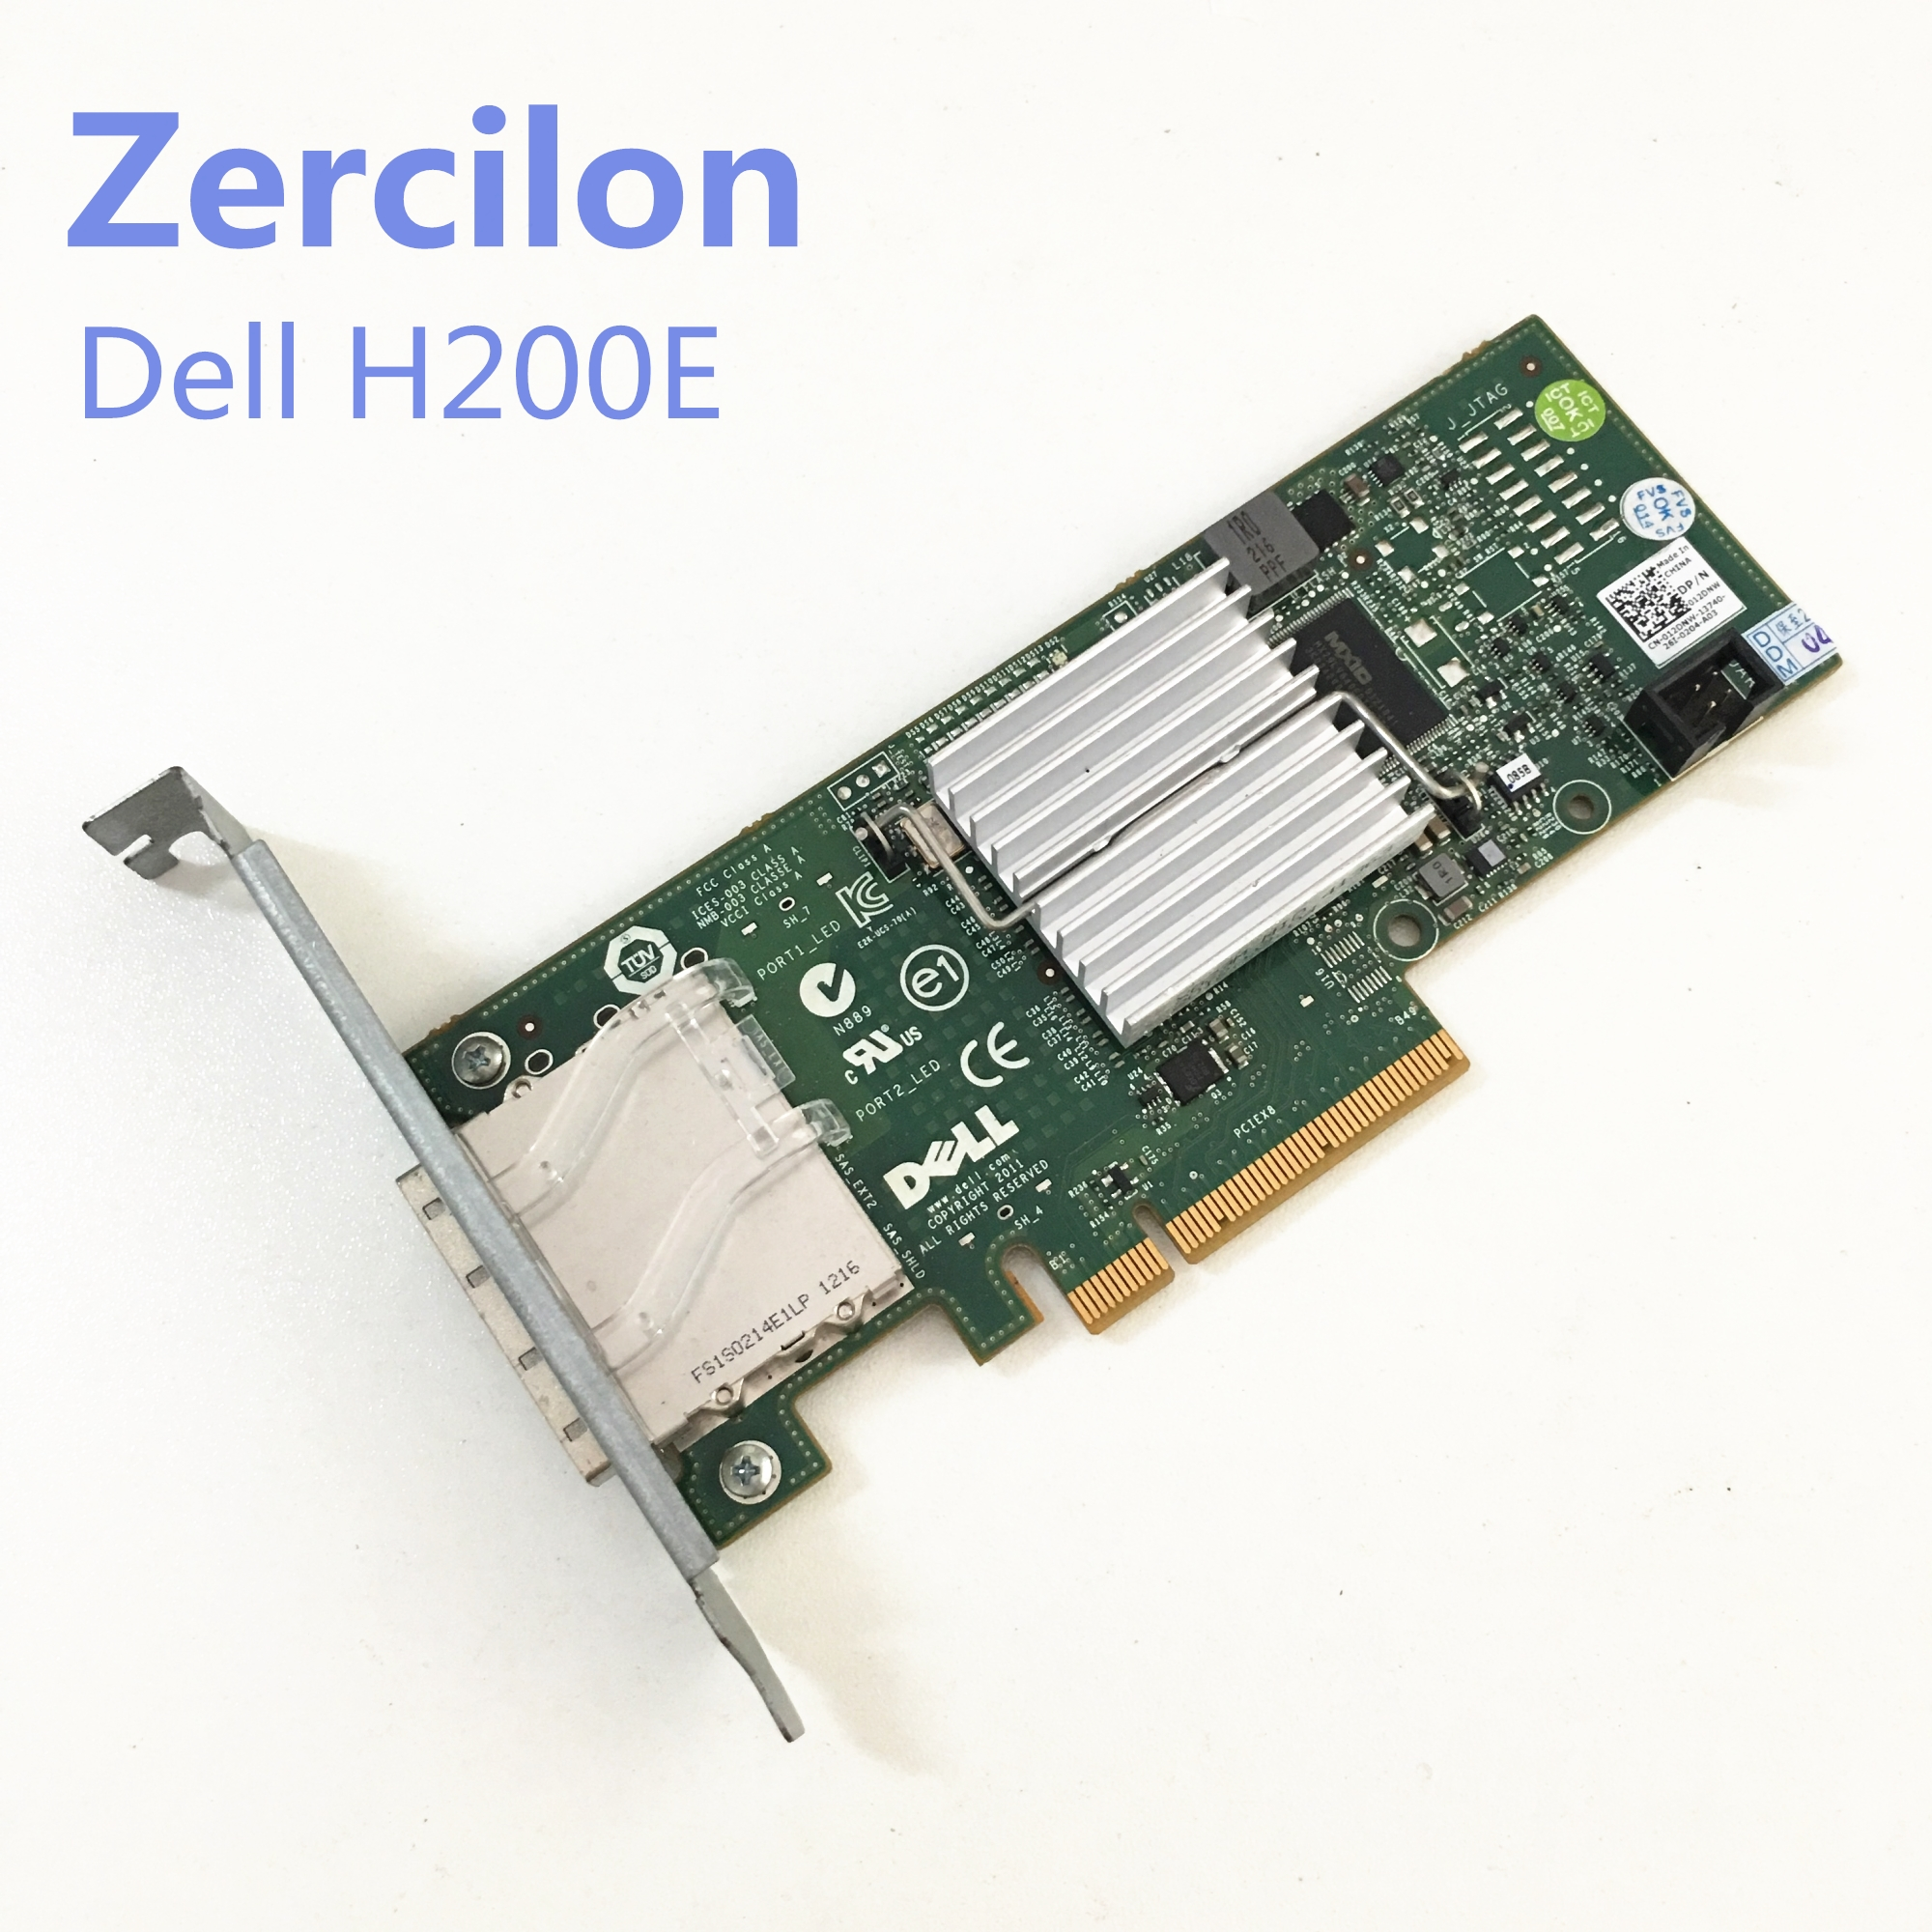 Used Original DELL H200E 6GB HBA SAS Channel Card 2 Port Ext SFF-8088 12DNW LSISAS2008=LSI 9200-8E